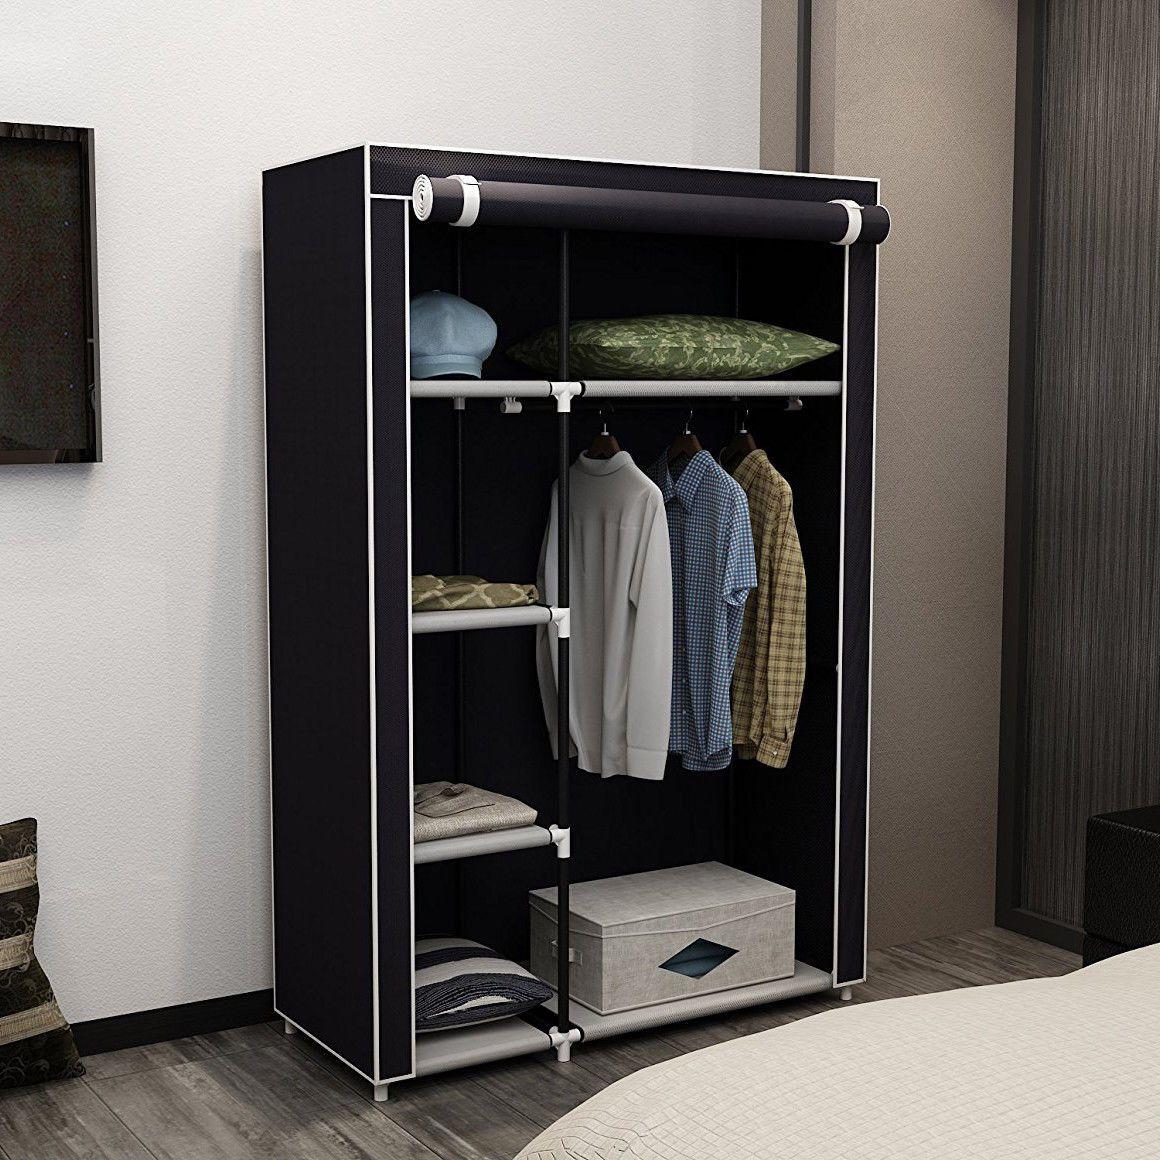 "New 63"" Portable Closet Storage Organizer Wardrobe Clothes ..."